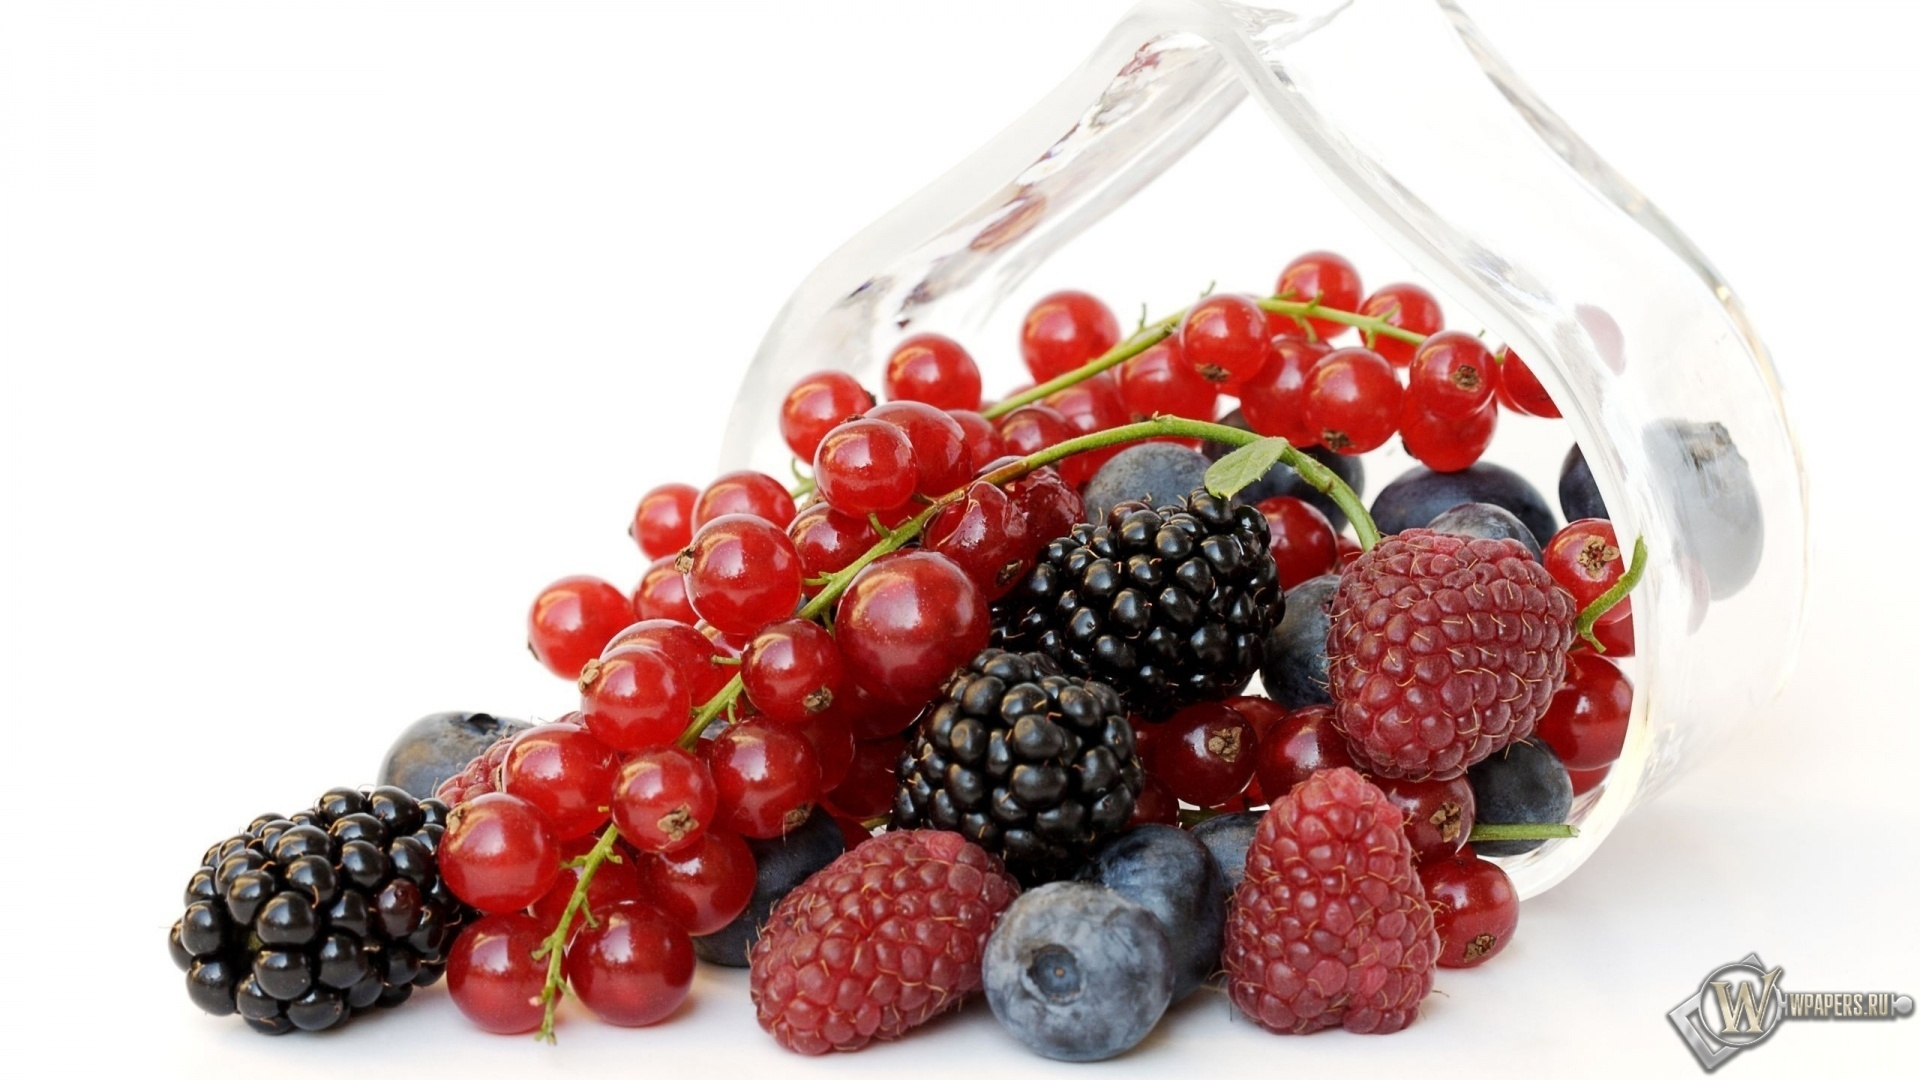 Аппетитные ягоды 1920x1080